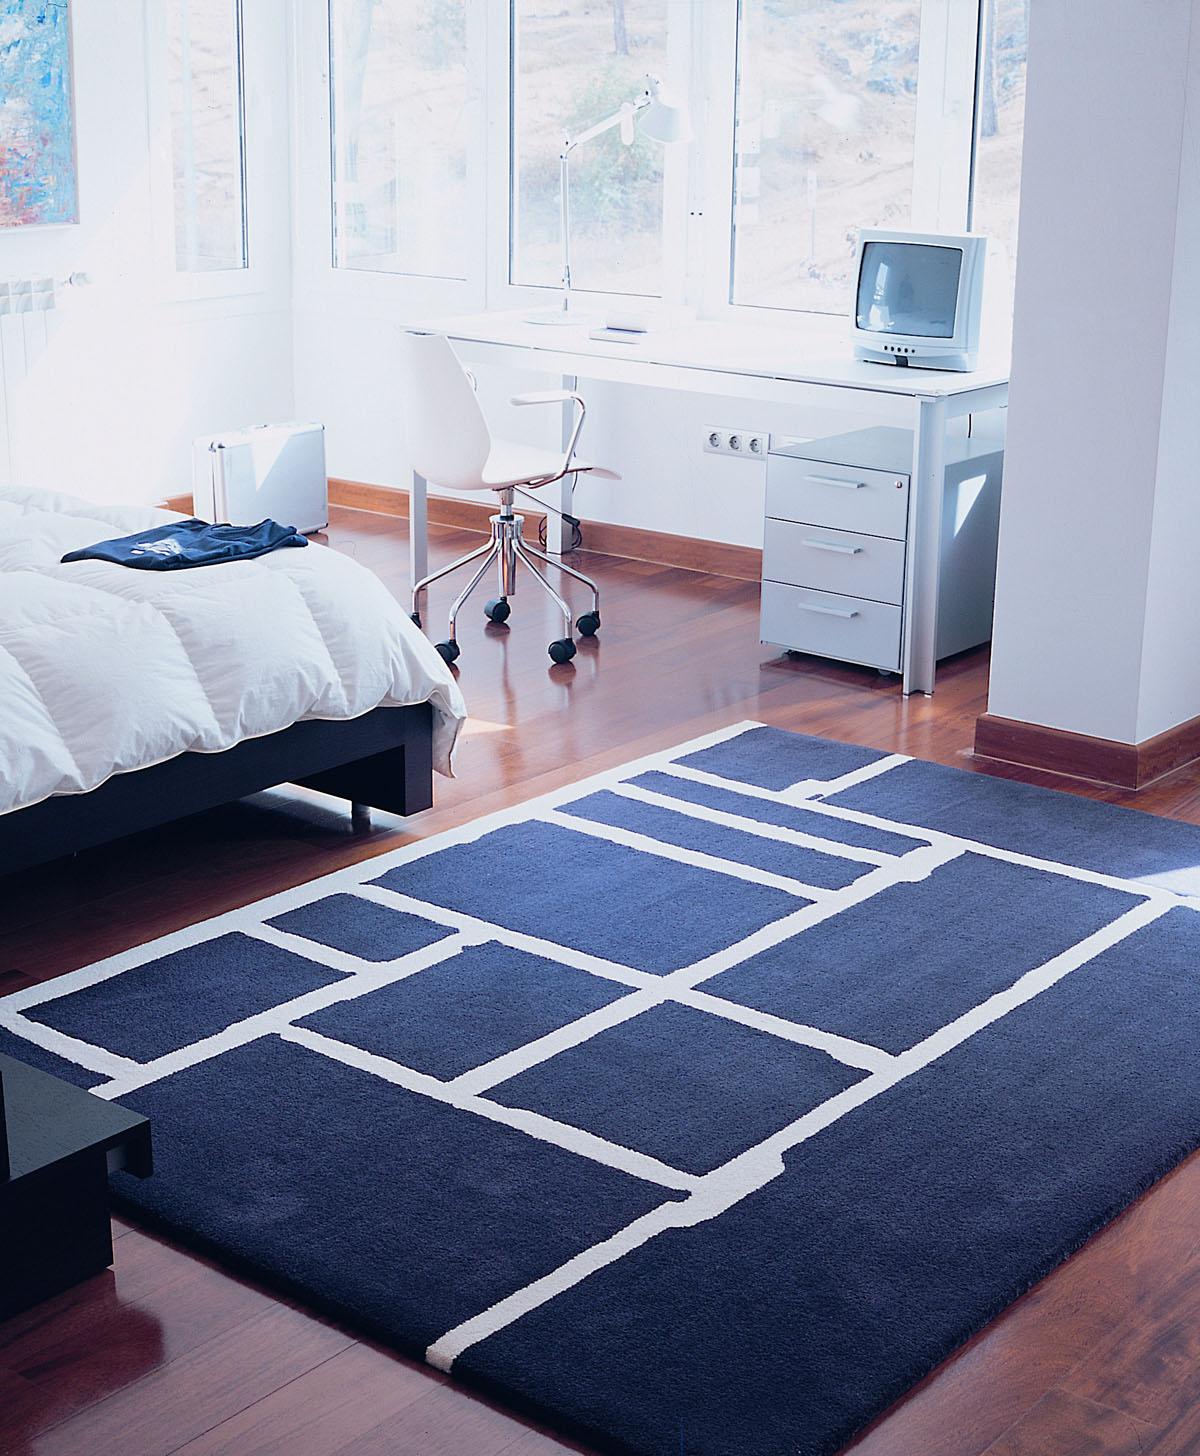 alpujarre a alfombras de dise o moderno